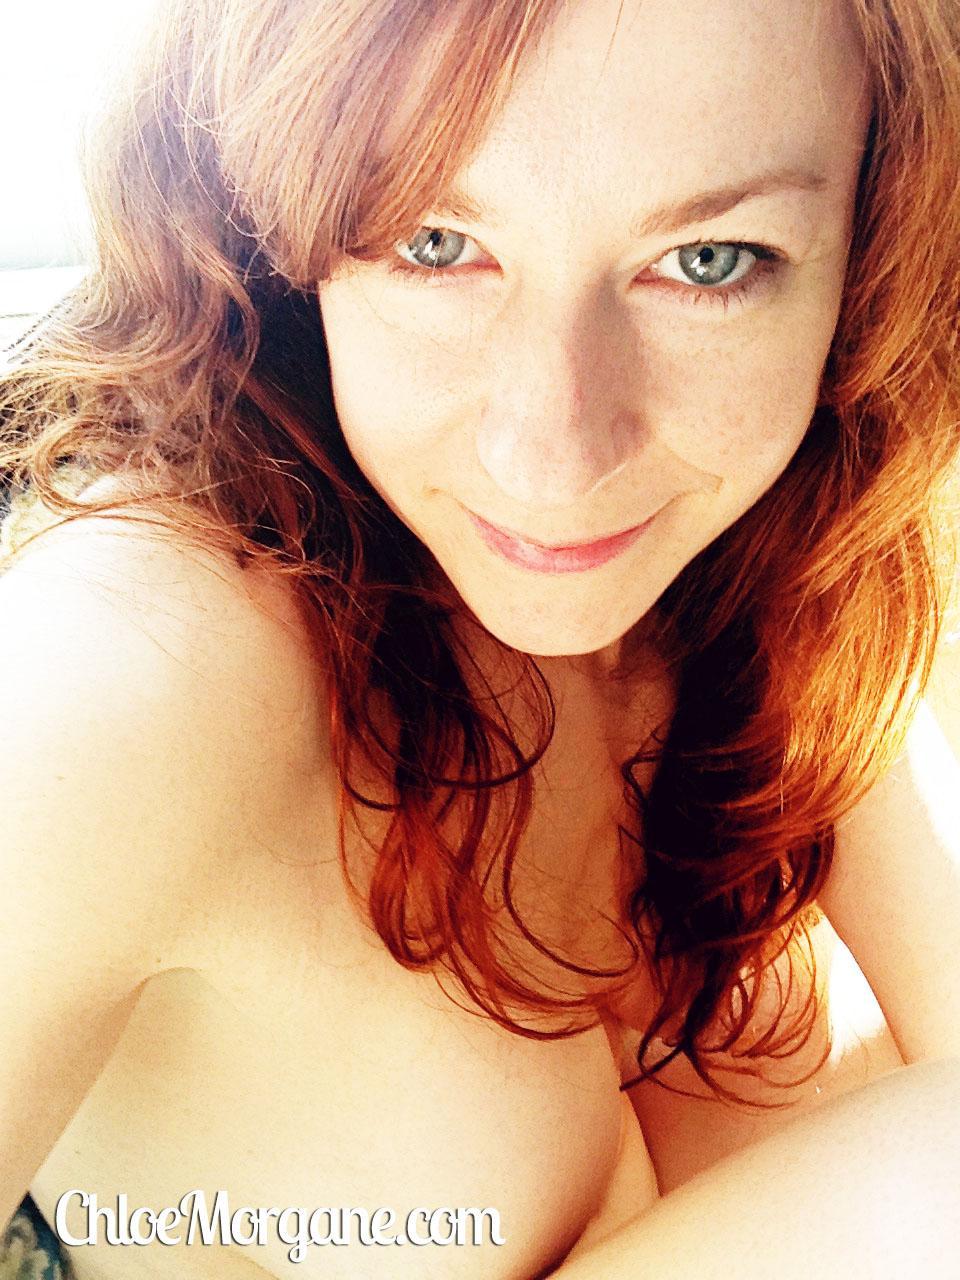 Chloe Morgane in Good Morning Blowjob